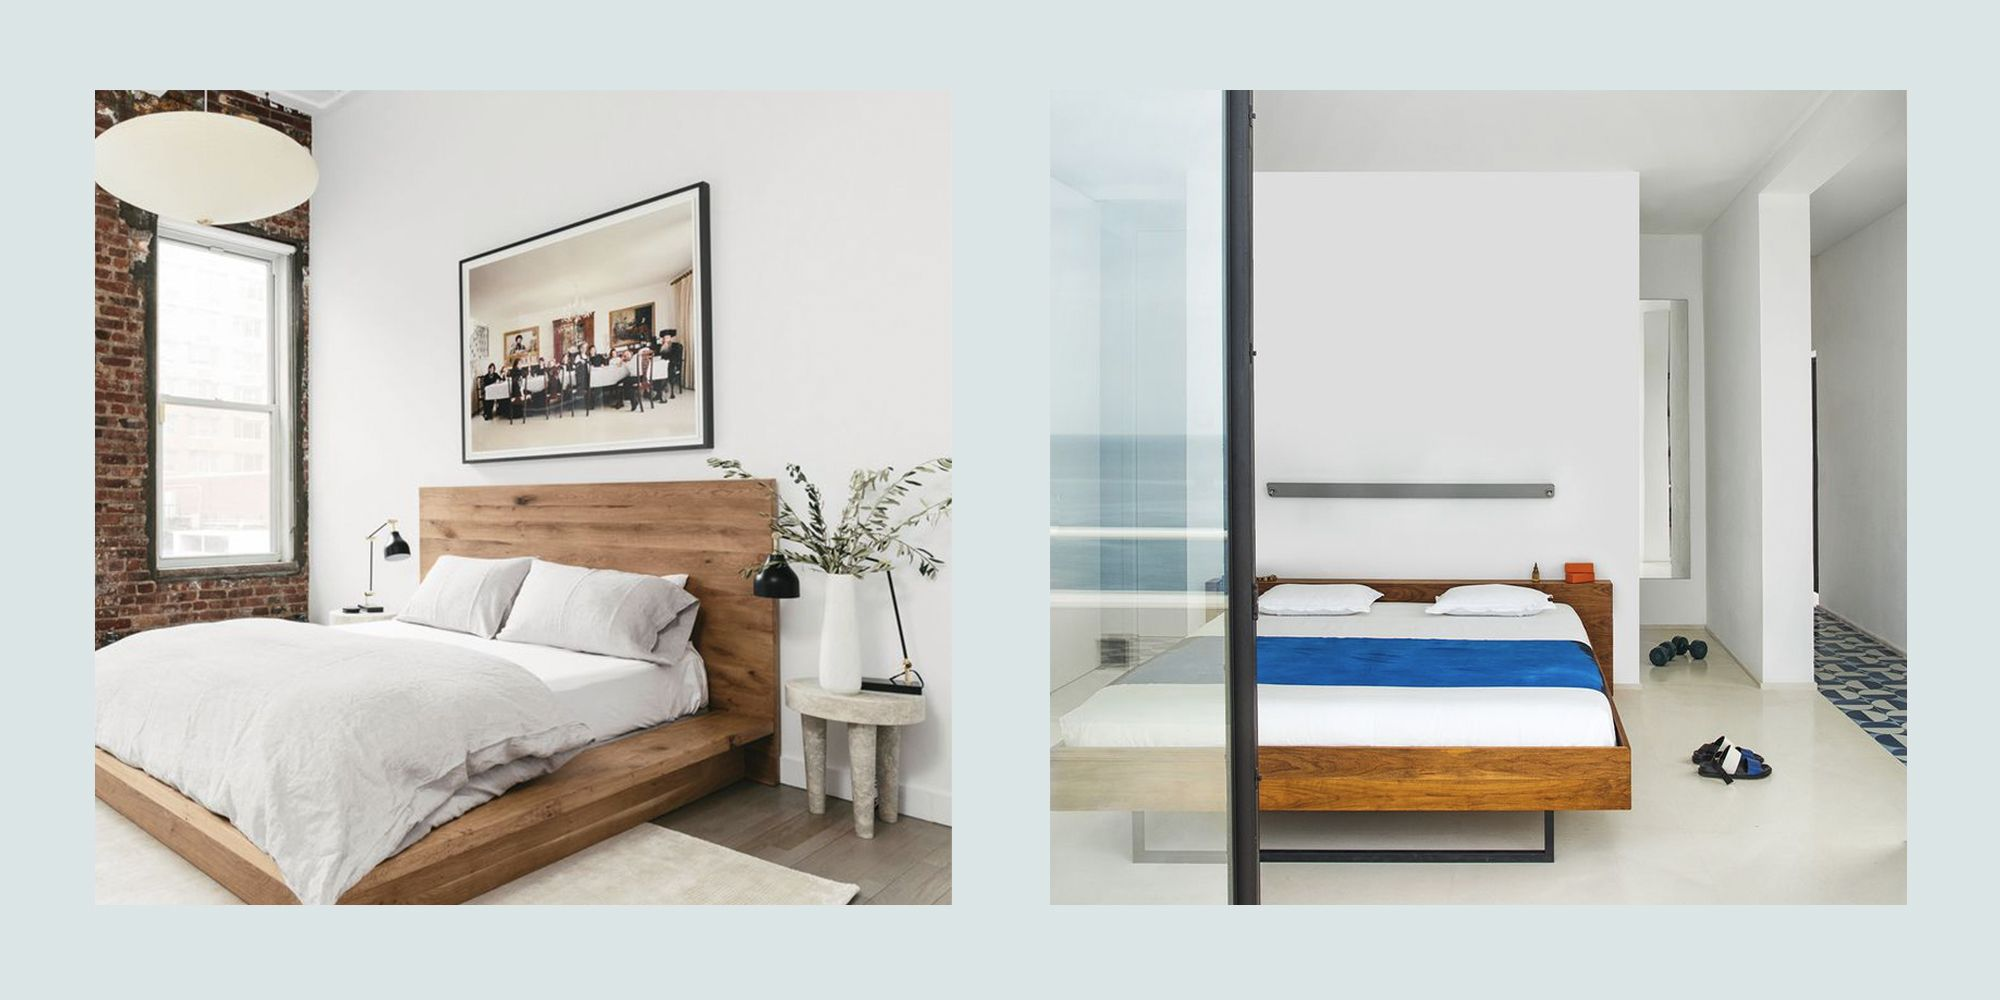 Elle Decor & 30+ Minimalist Bedroom Decor Ideas - Modern Designs for Minimalist ...